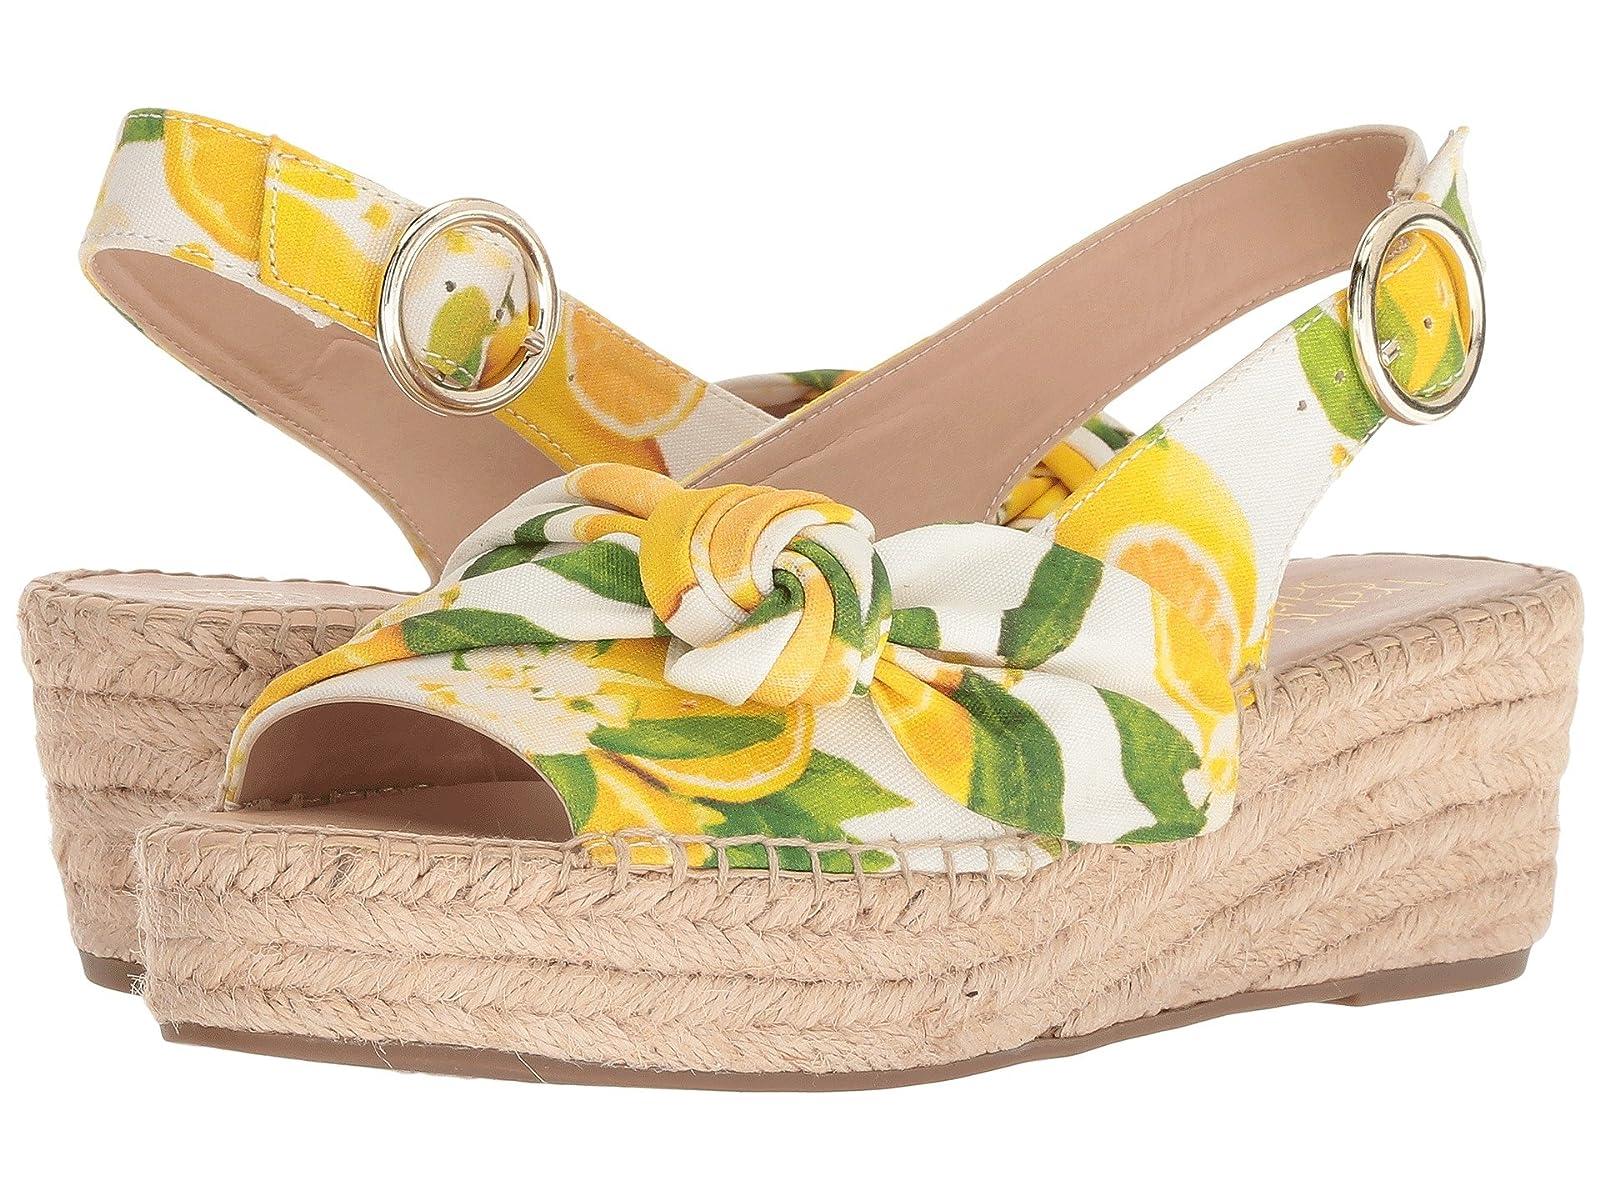 Franco Sarto PixieCheap and distinctive eye-catching shoes